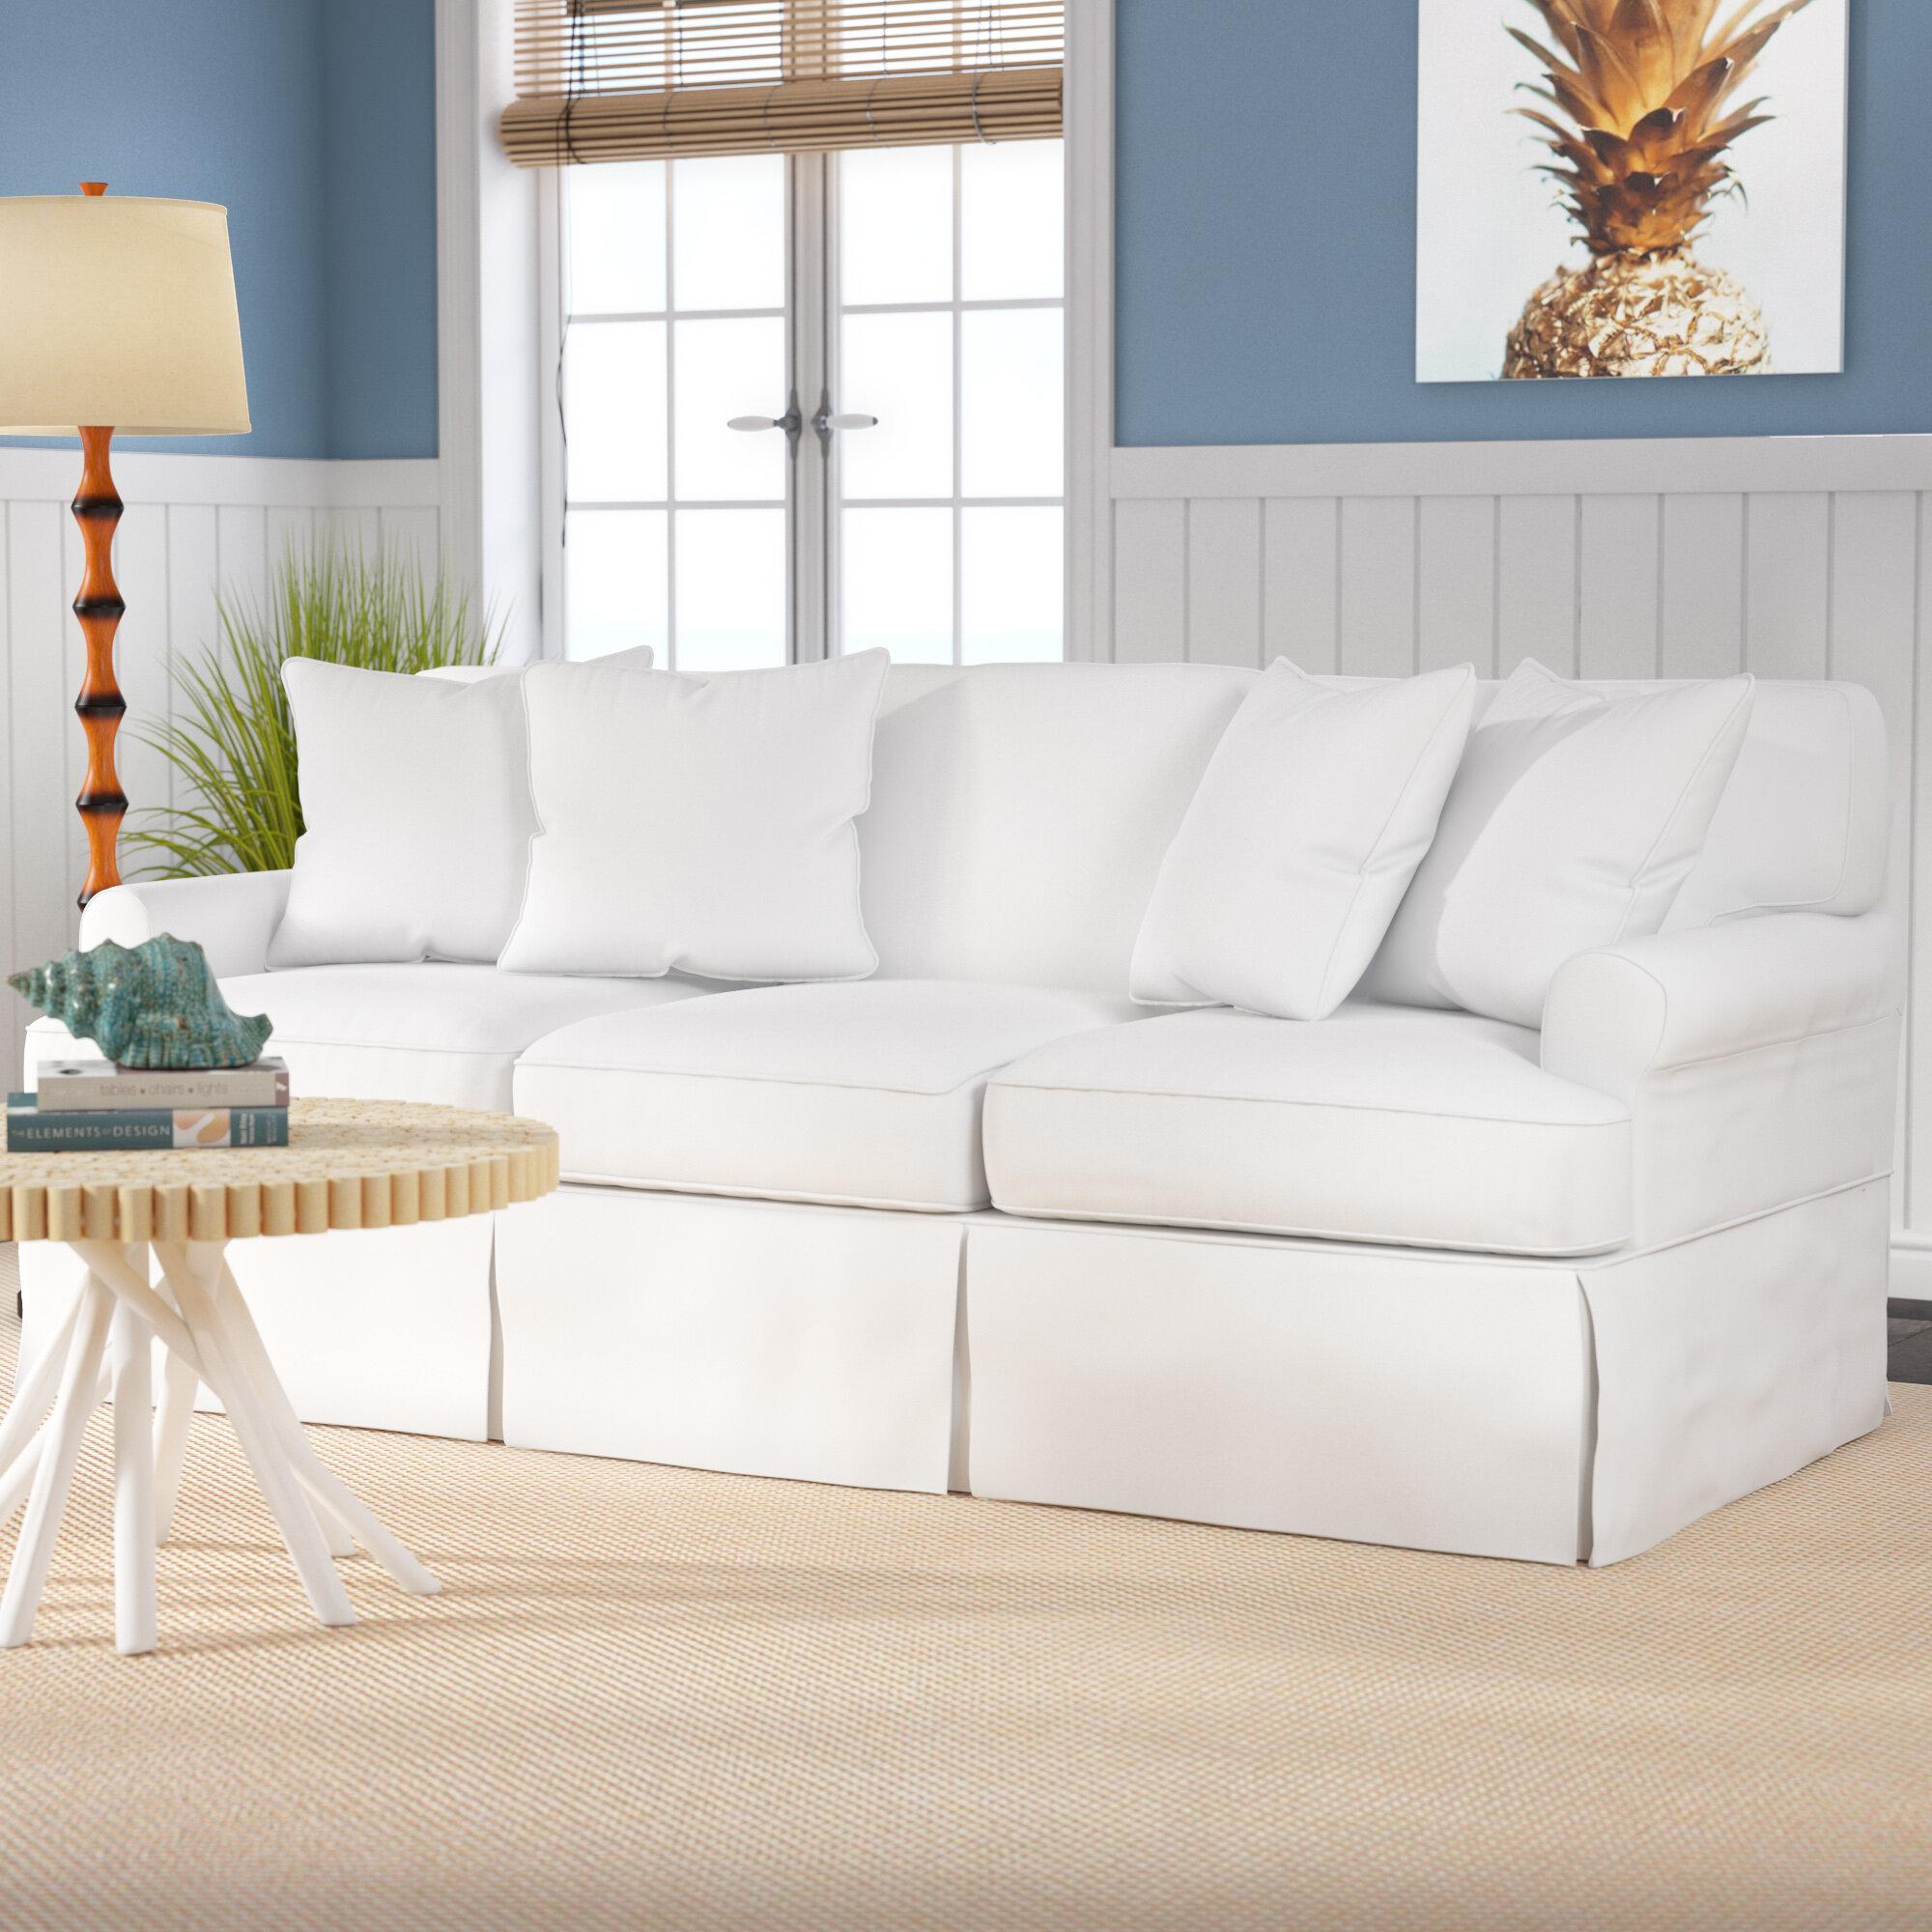 Beachcrest Home Coral Gables Slipcovered Sofa & Reviews | Wayfair